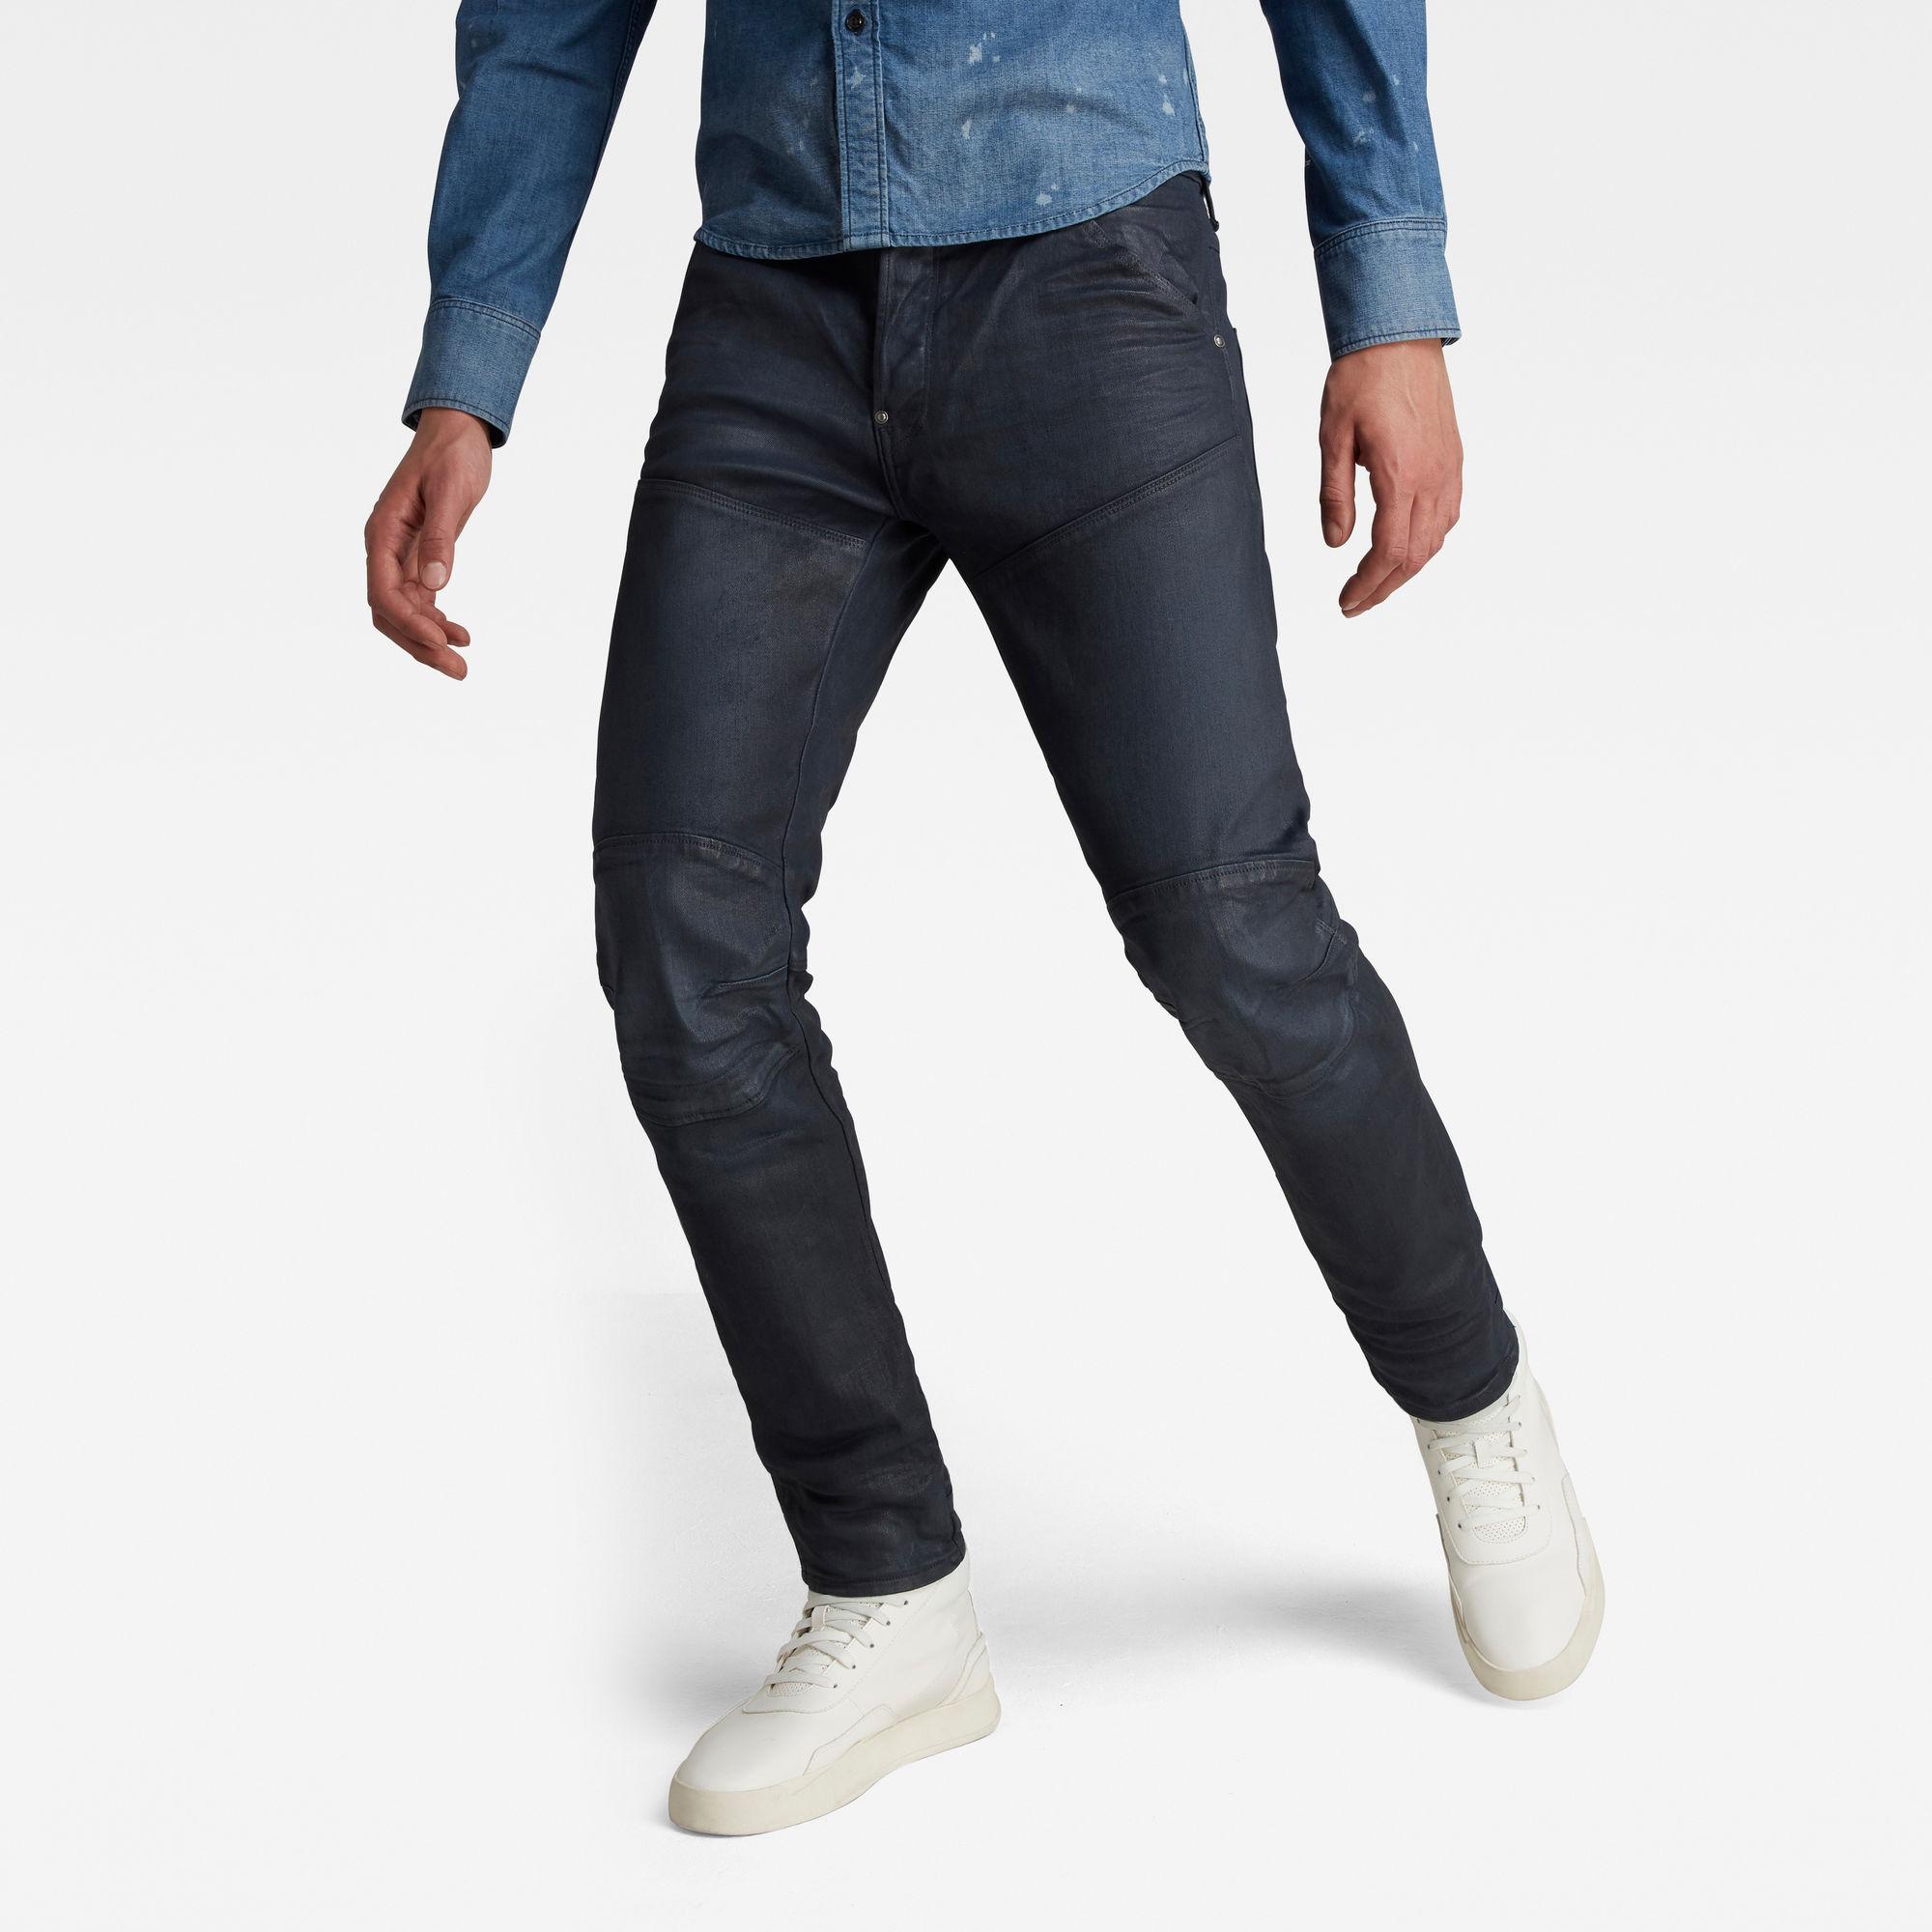 G-Star RAW Heren 5620 3D Slim Jeans Donkerblauw